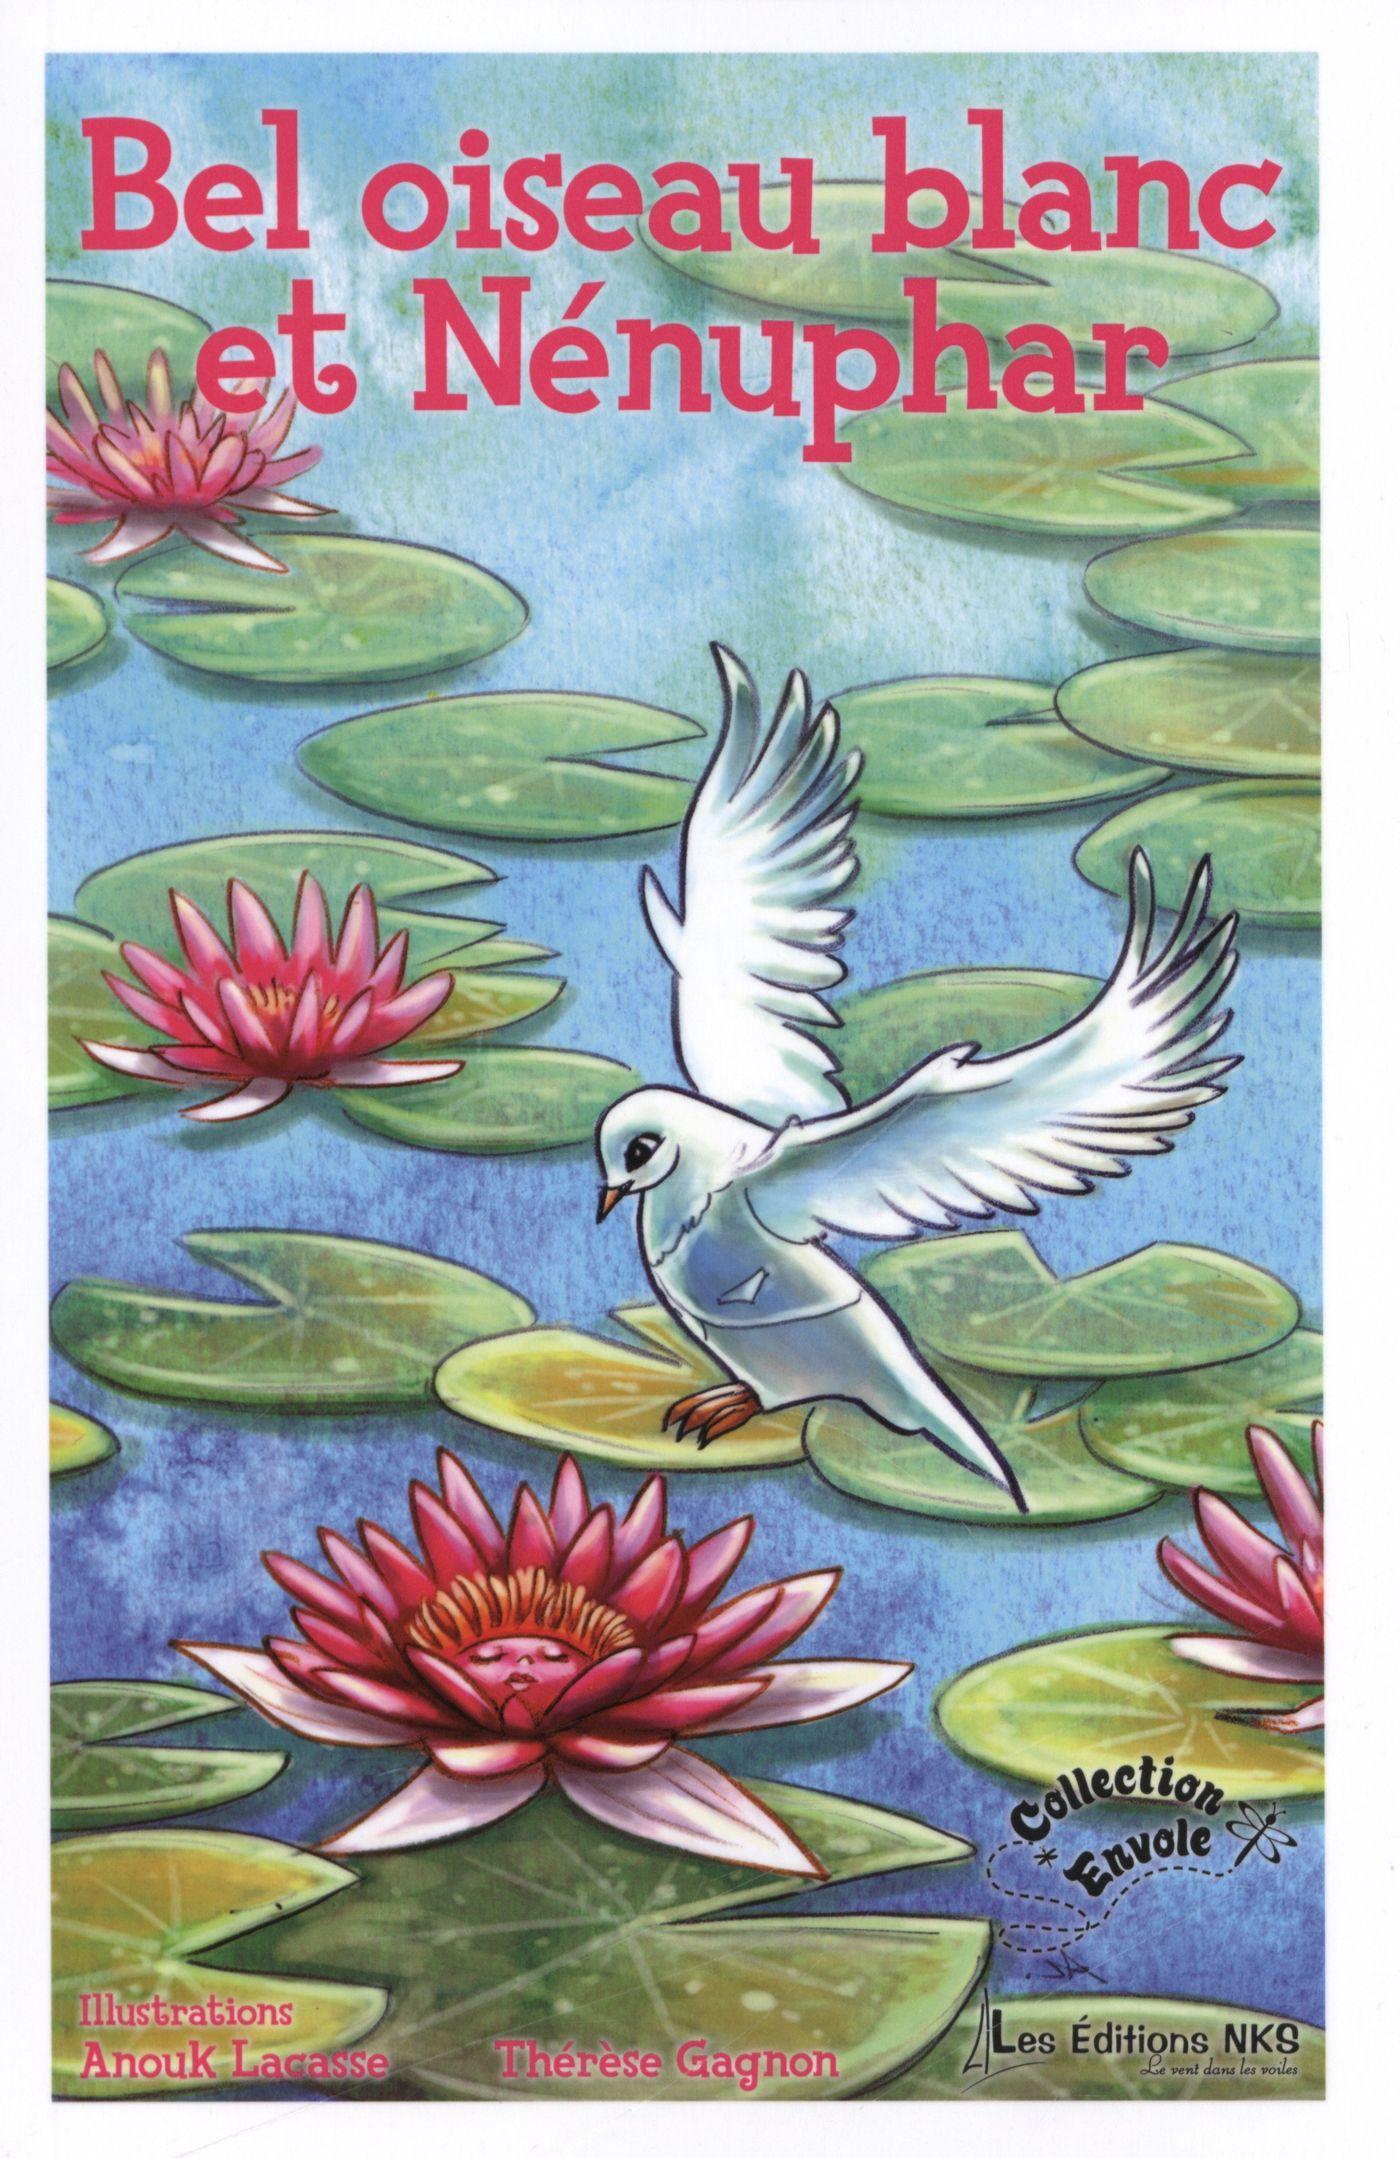 Bel oiseau blanc et Nénuphar